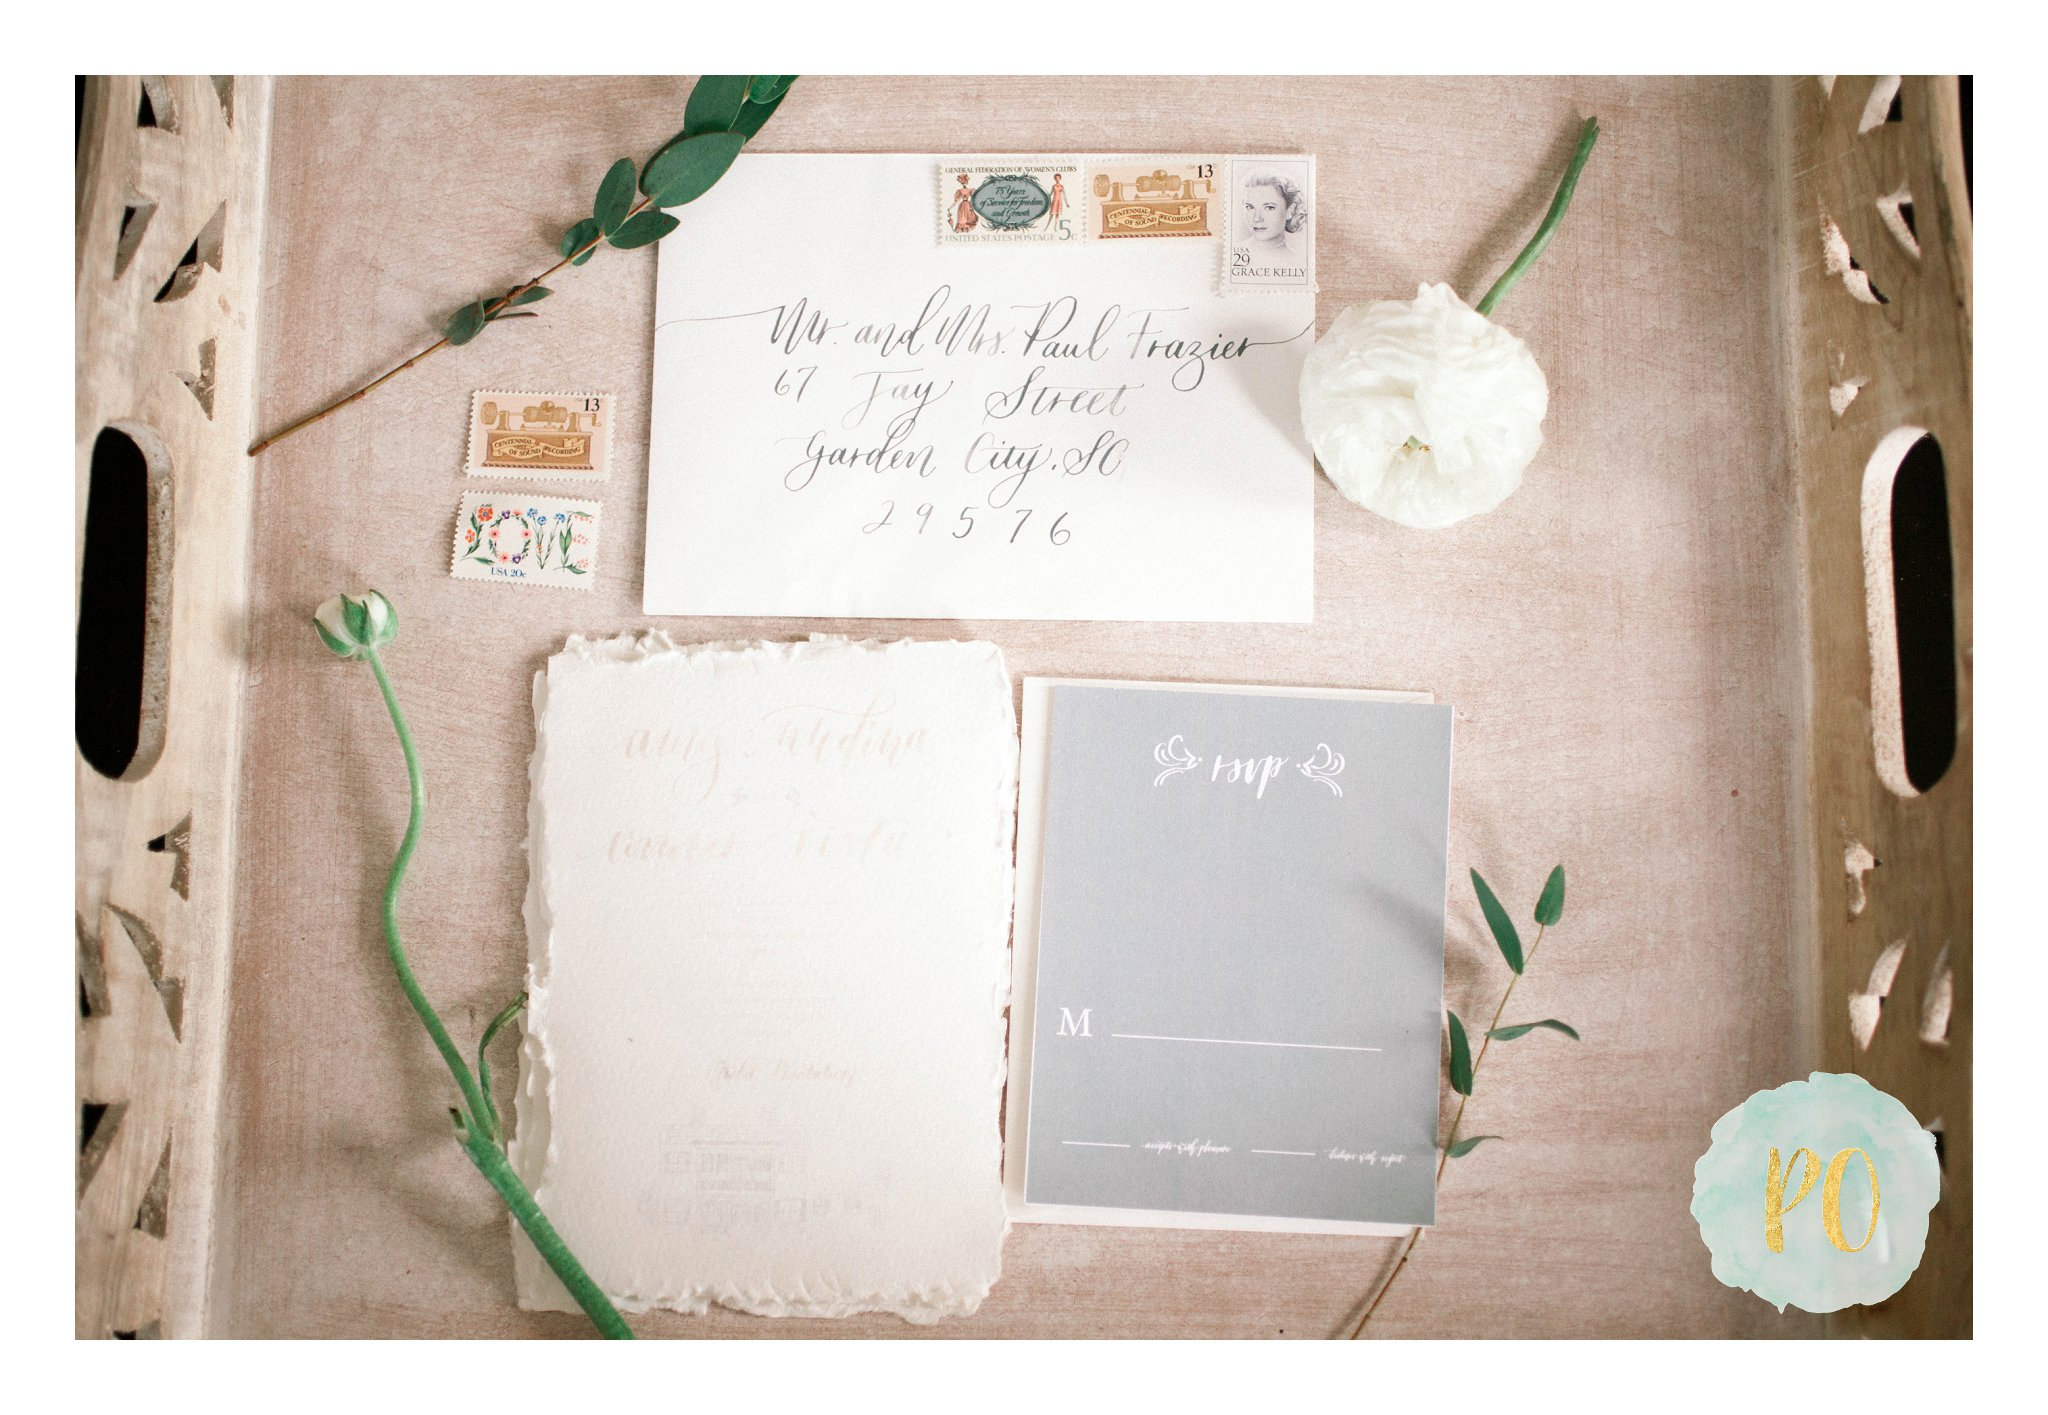 litchfield-plantation-wedding-invitation-pawleys-island-sc-photos_0035.jpg